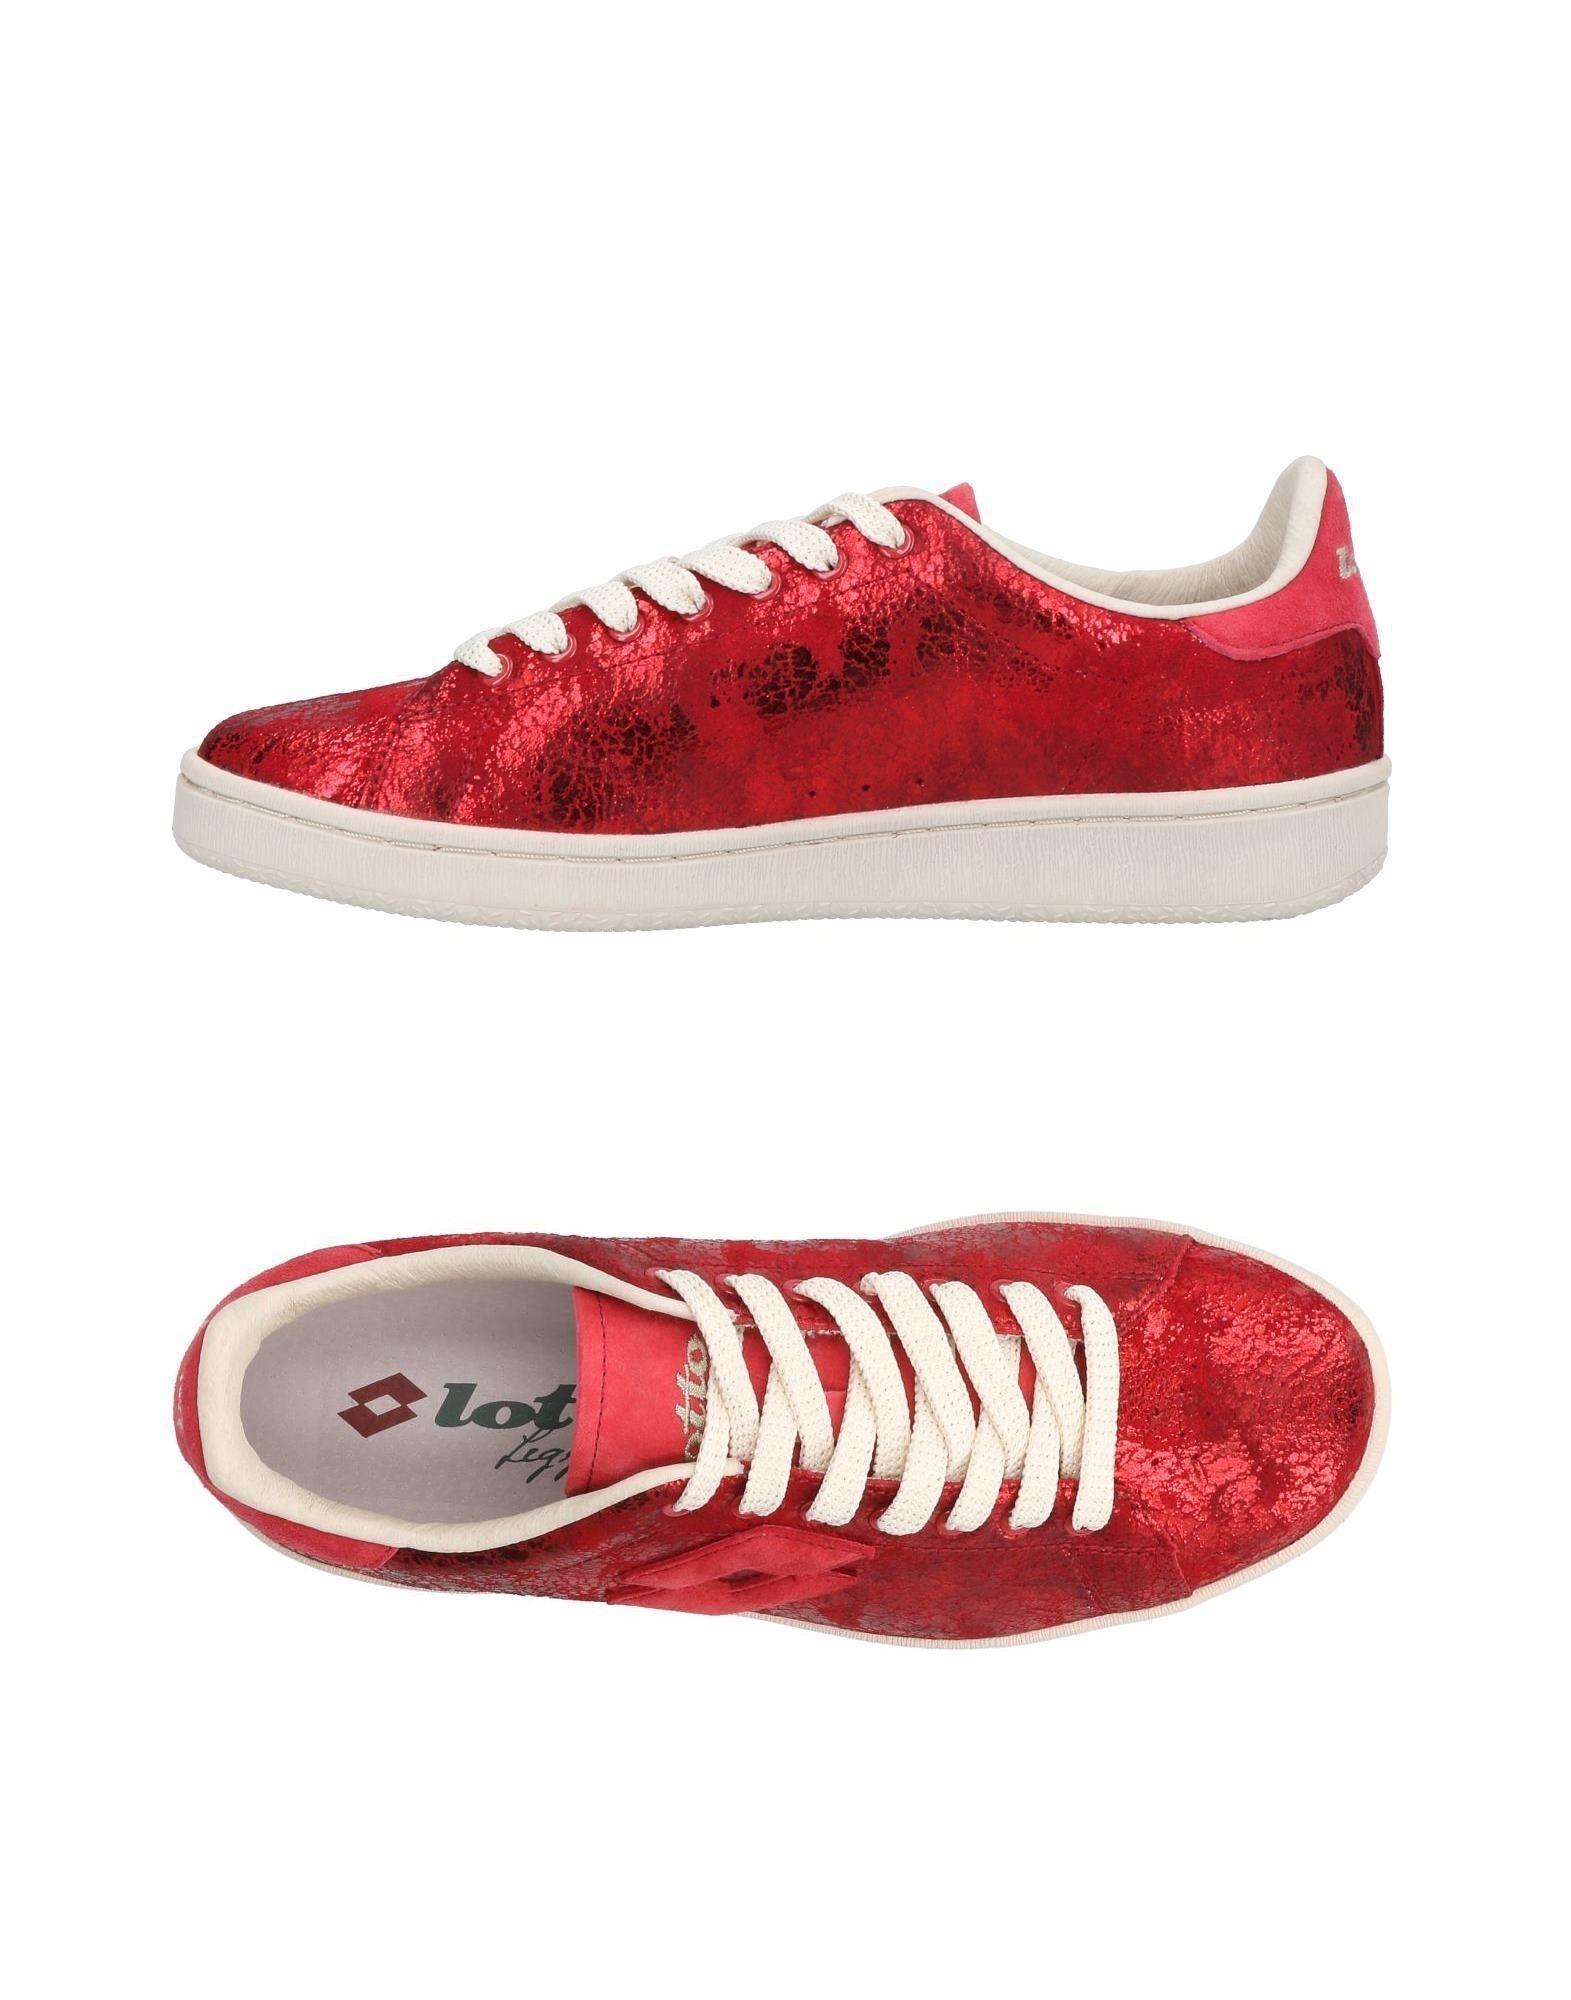 Lotto Leggenda Sneakers In Red